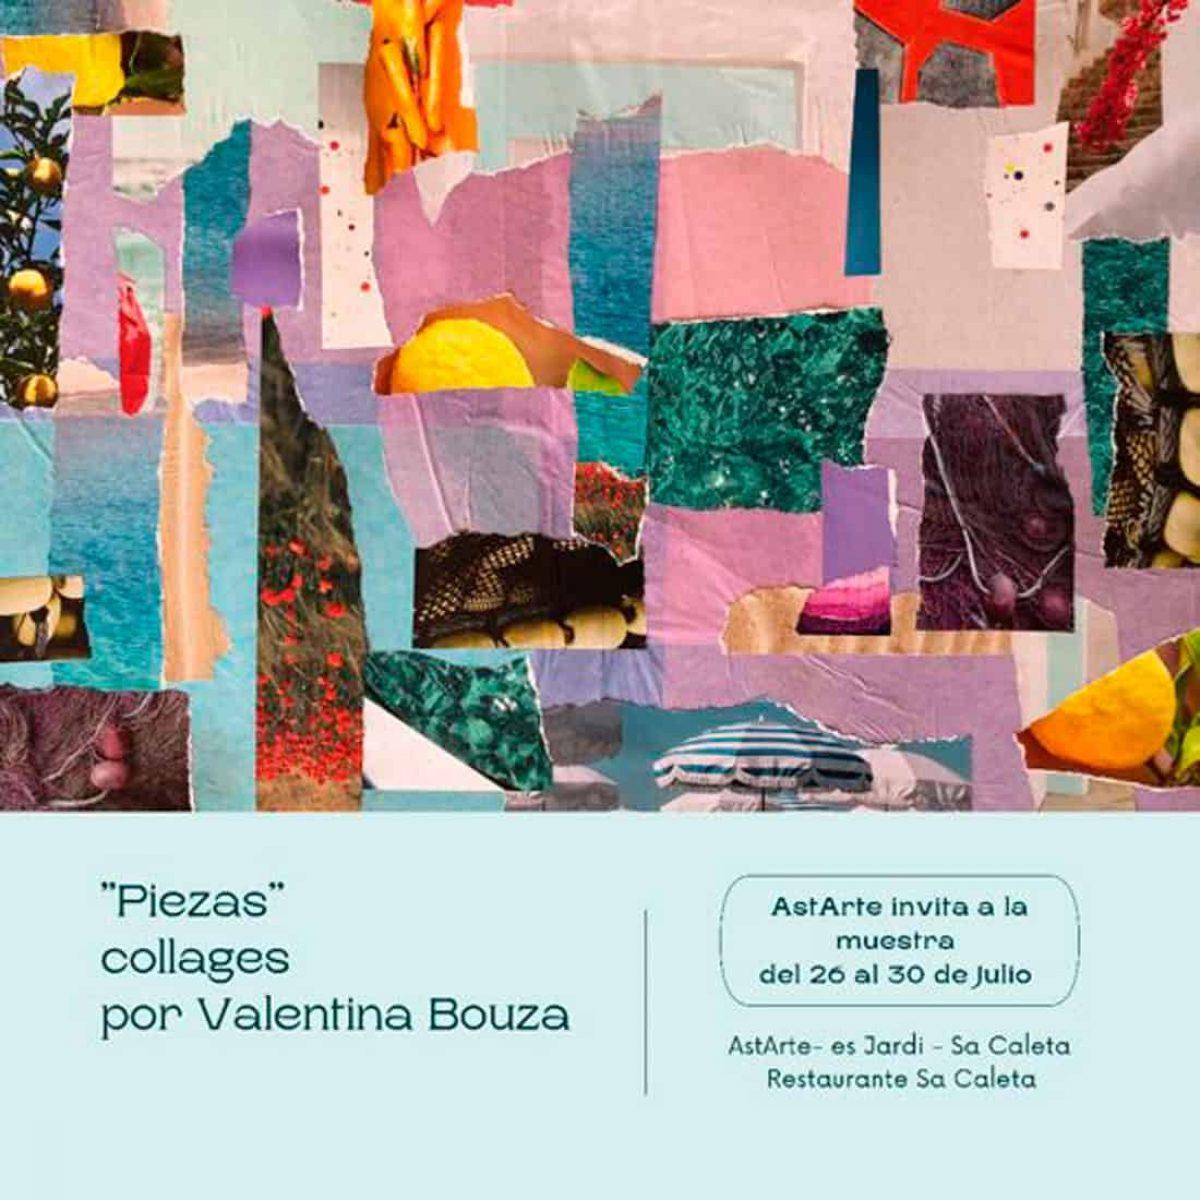 piezas-exposicion-collages-valentina-bouza-astarte-el-jardin-sa-caleta-ibiza-2021-welcometoibiza